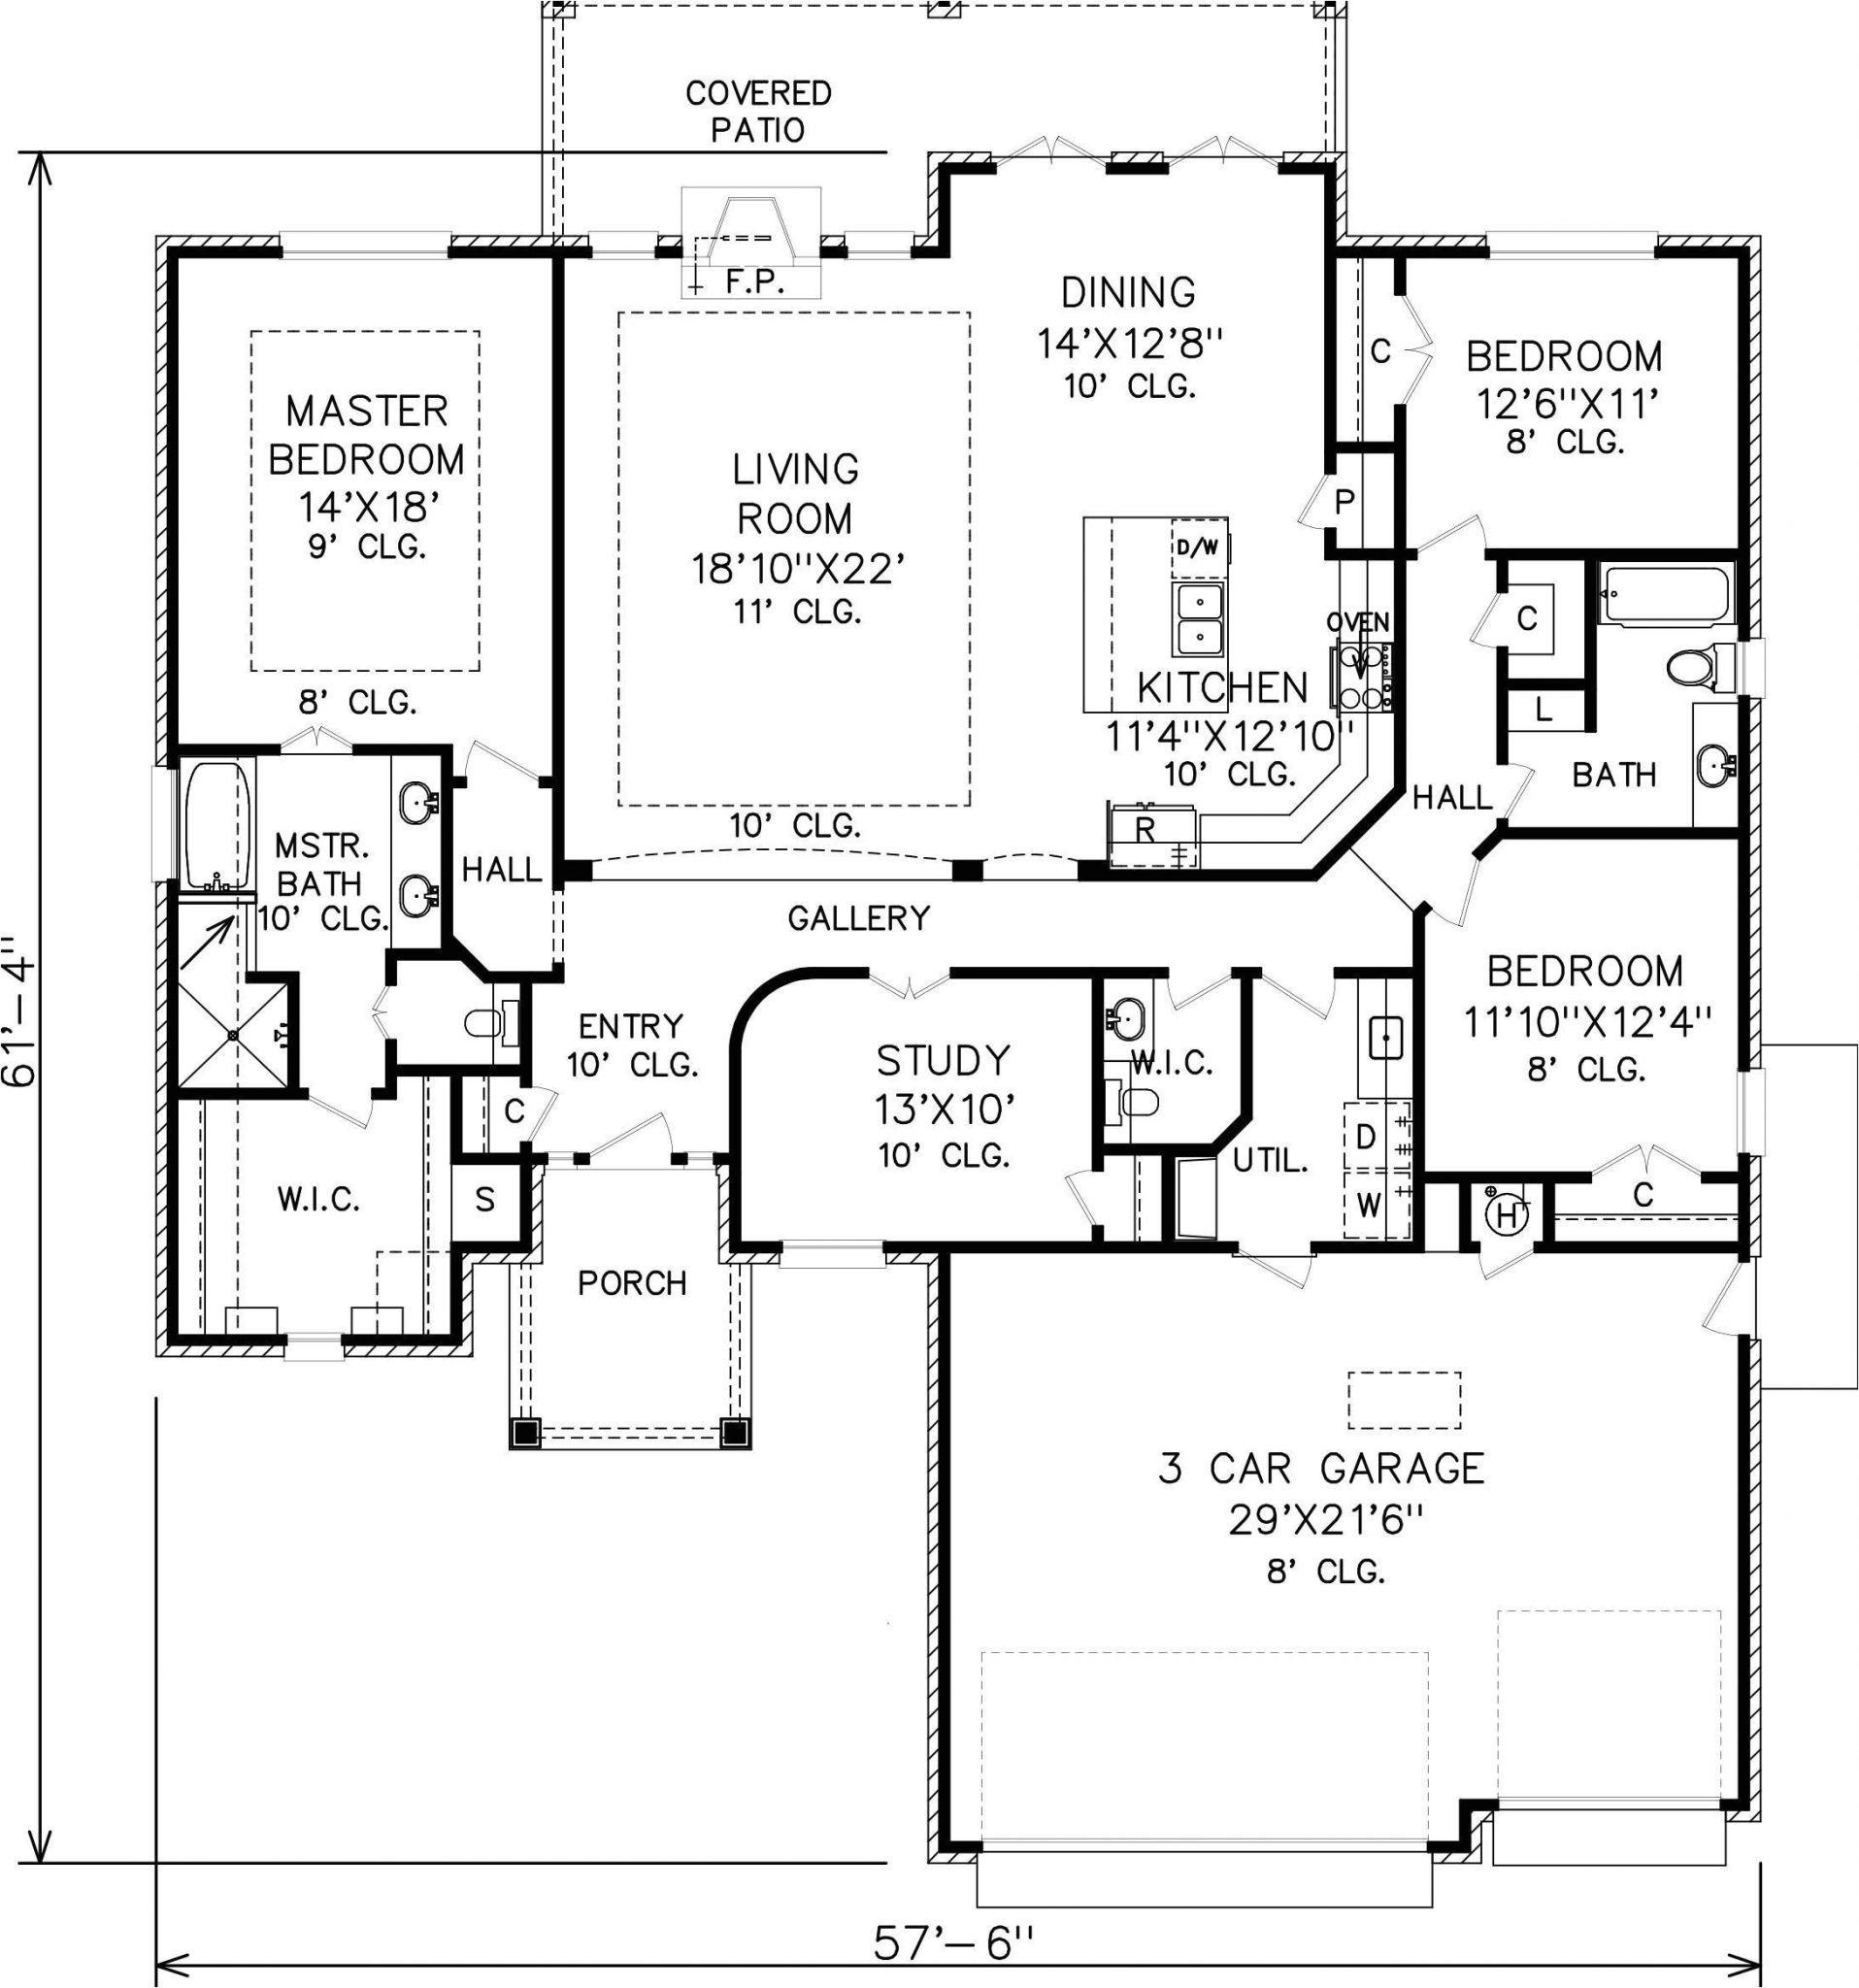 Architectural Floor Plans Luxury Floor Plans Shop House Plans Floor Plan Design